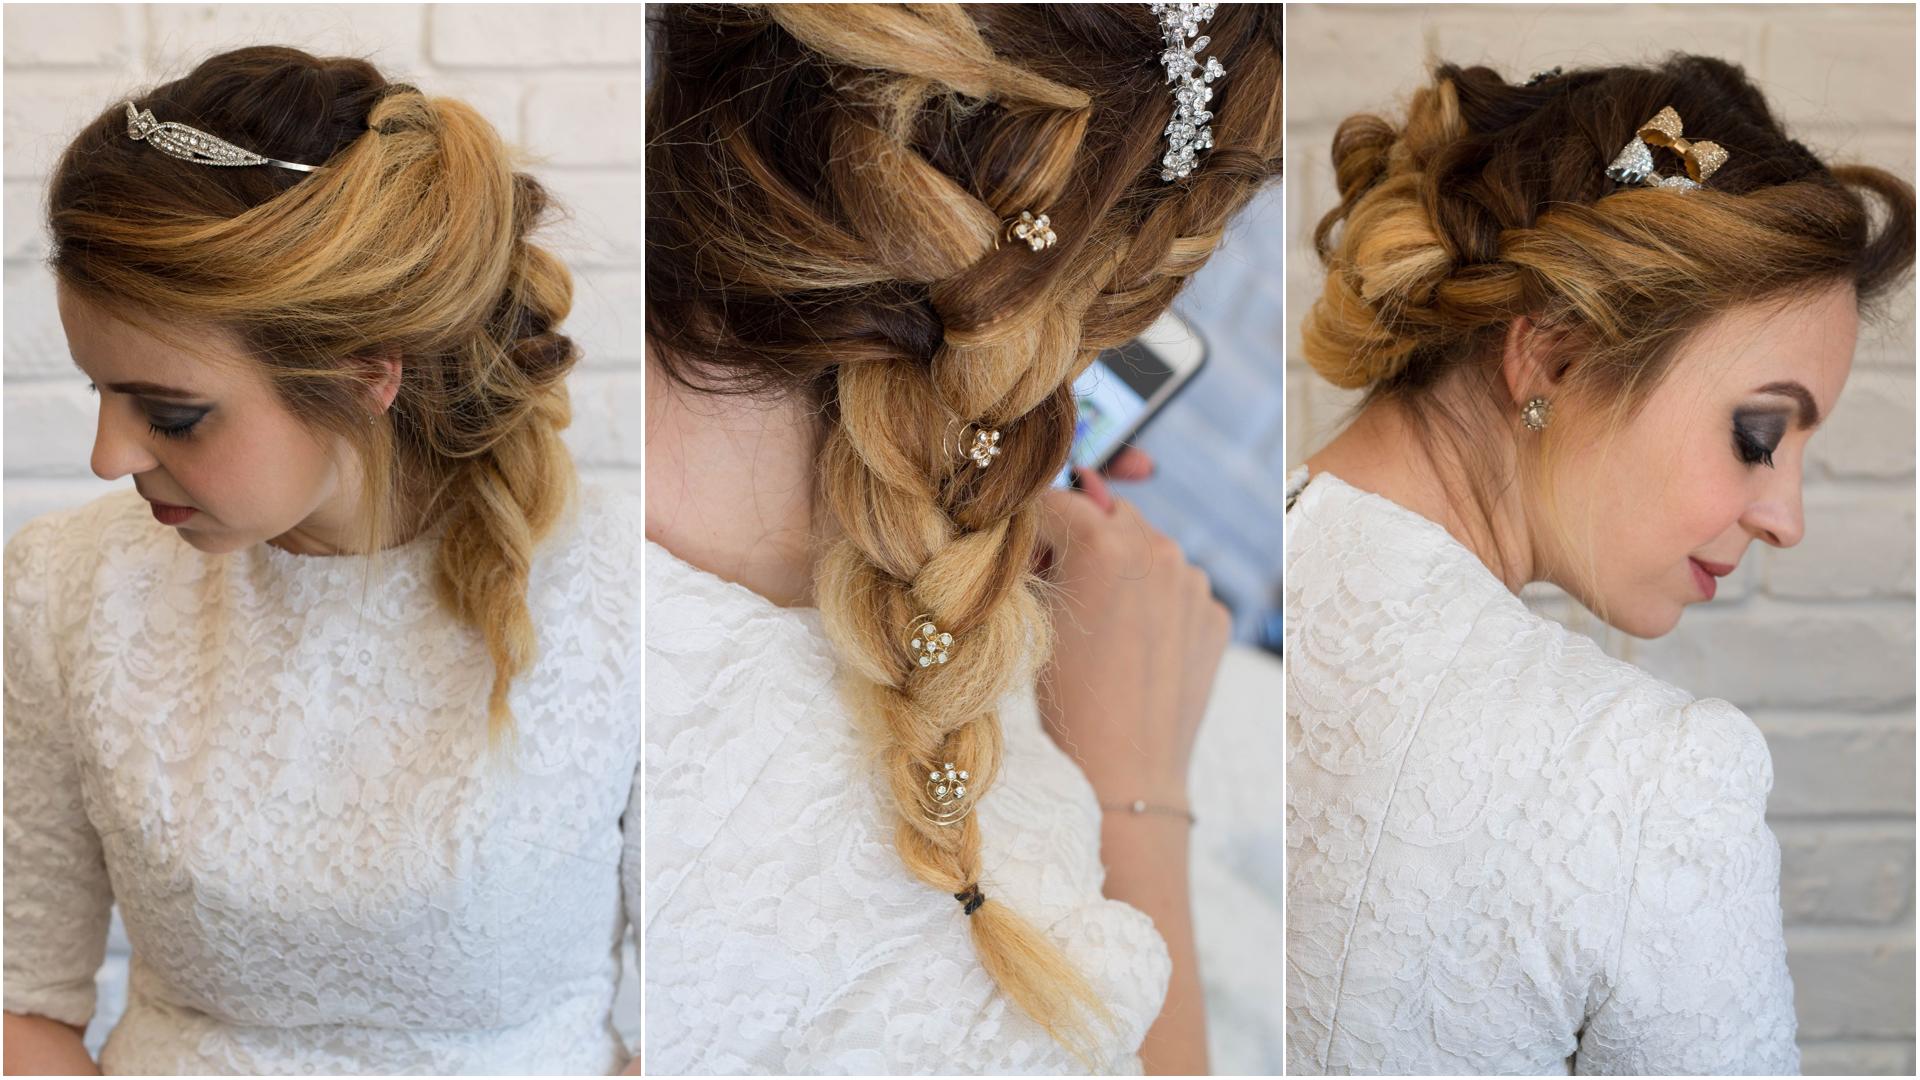 Acconciature da cerimonia per capelli lunghi 55effad6ef1a